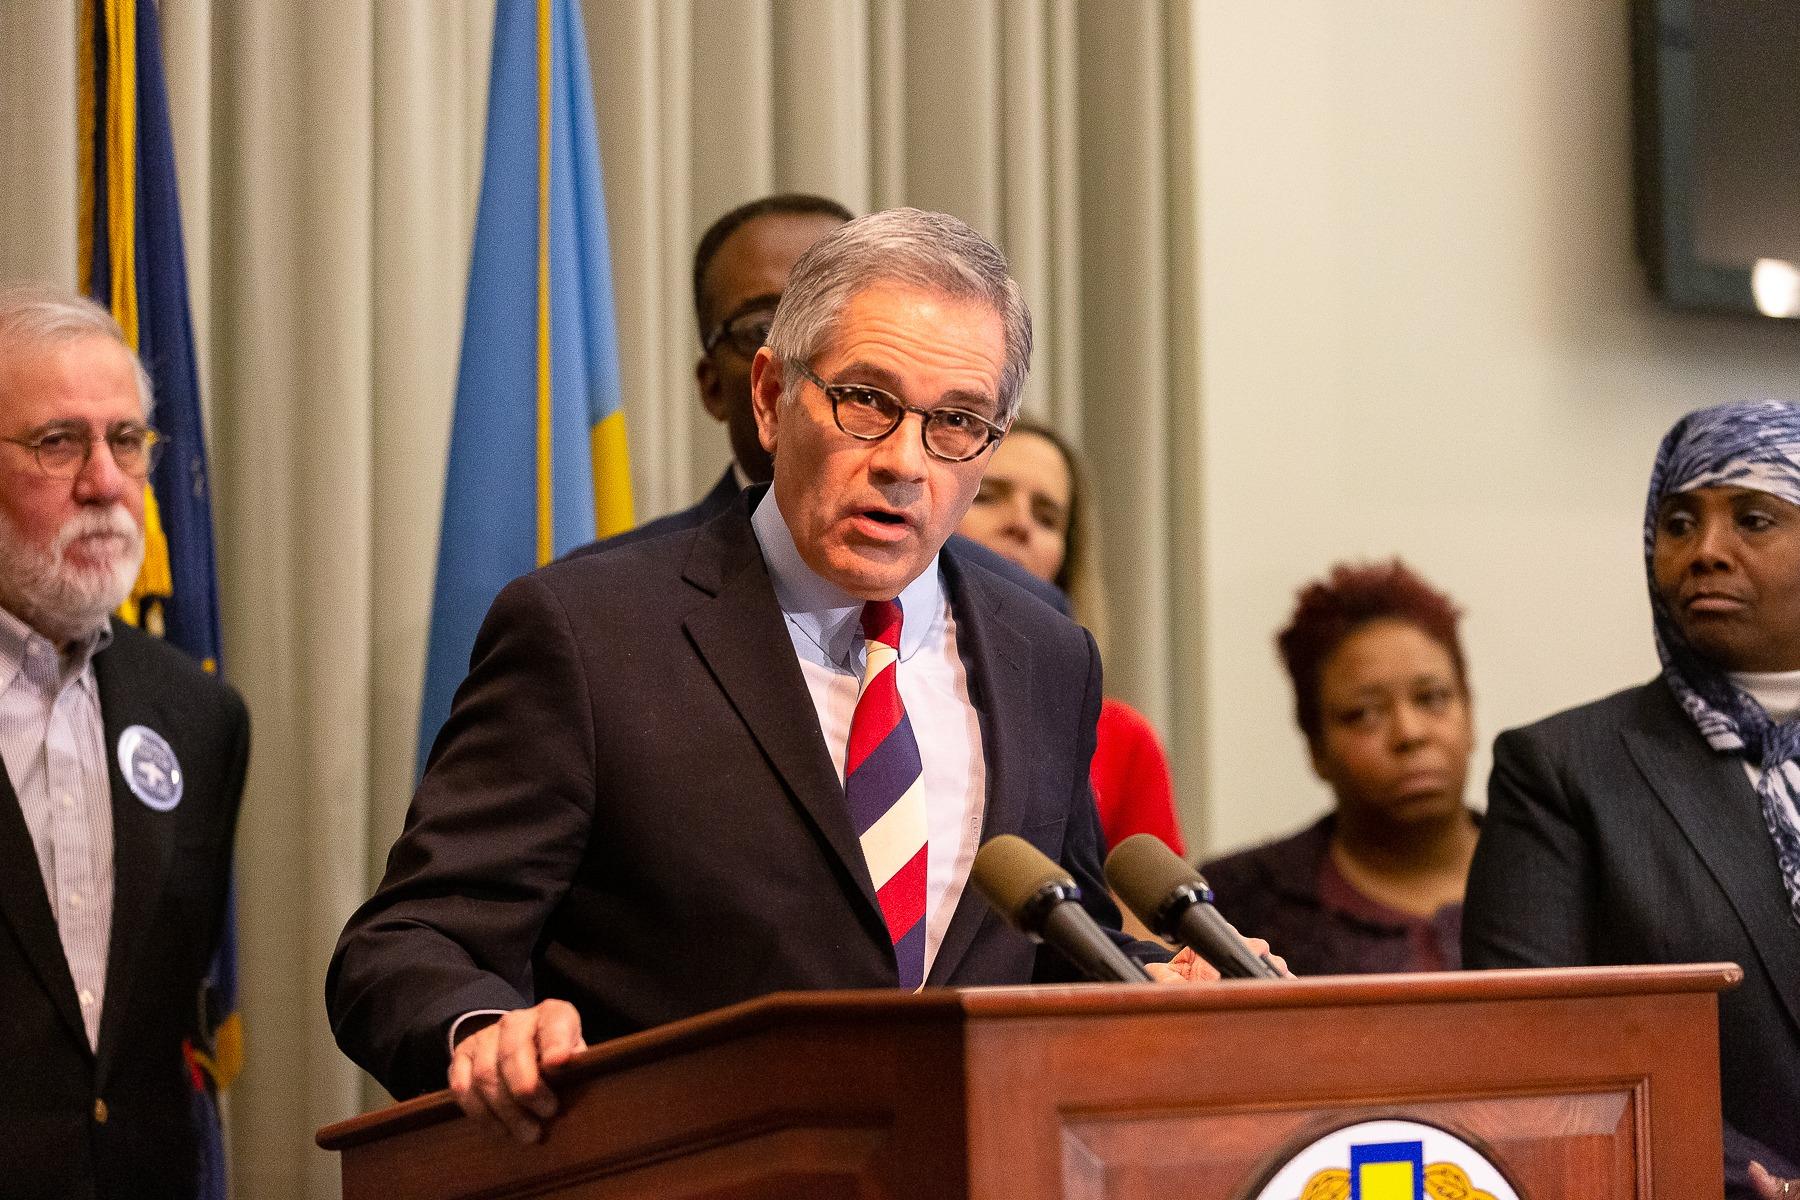 Philadelphia D.A. Asks Court to Declare Death Penalty System Unconstitutional